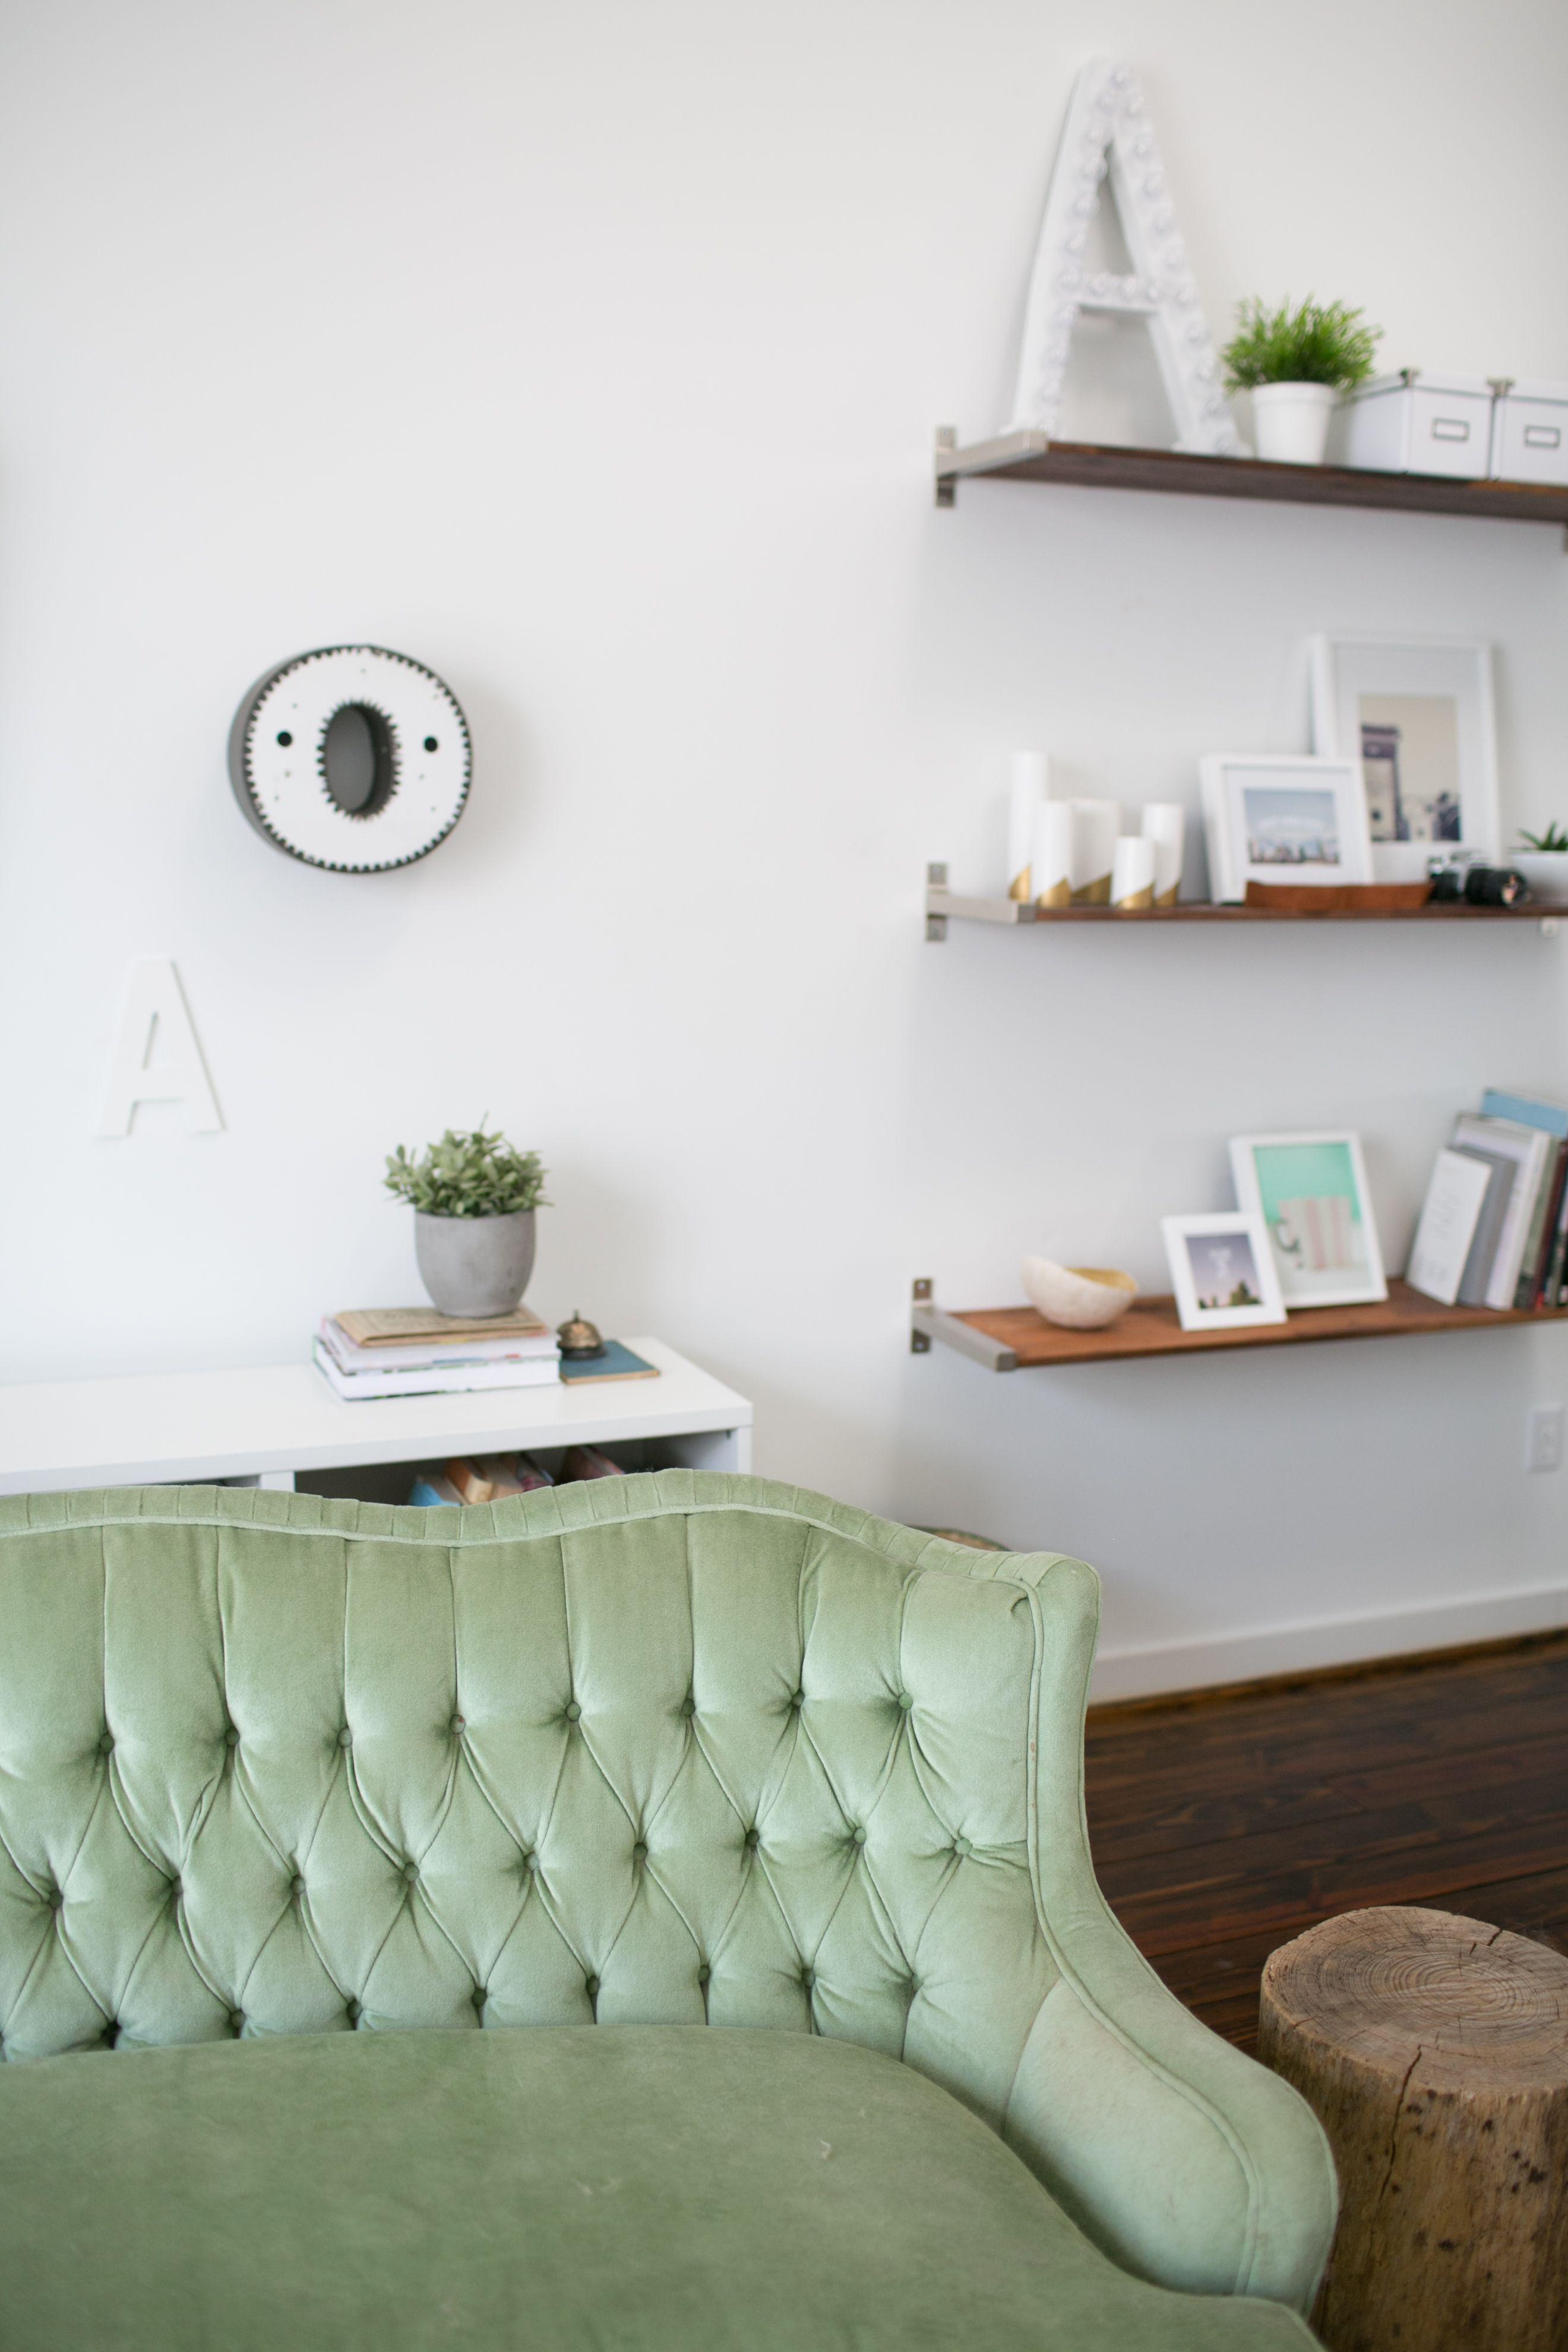 Ashley roses houston townhouse tour living room shelving eclectic